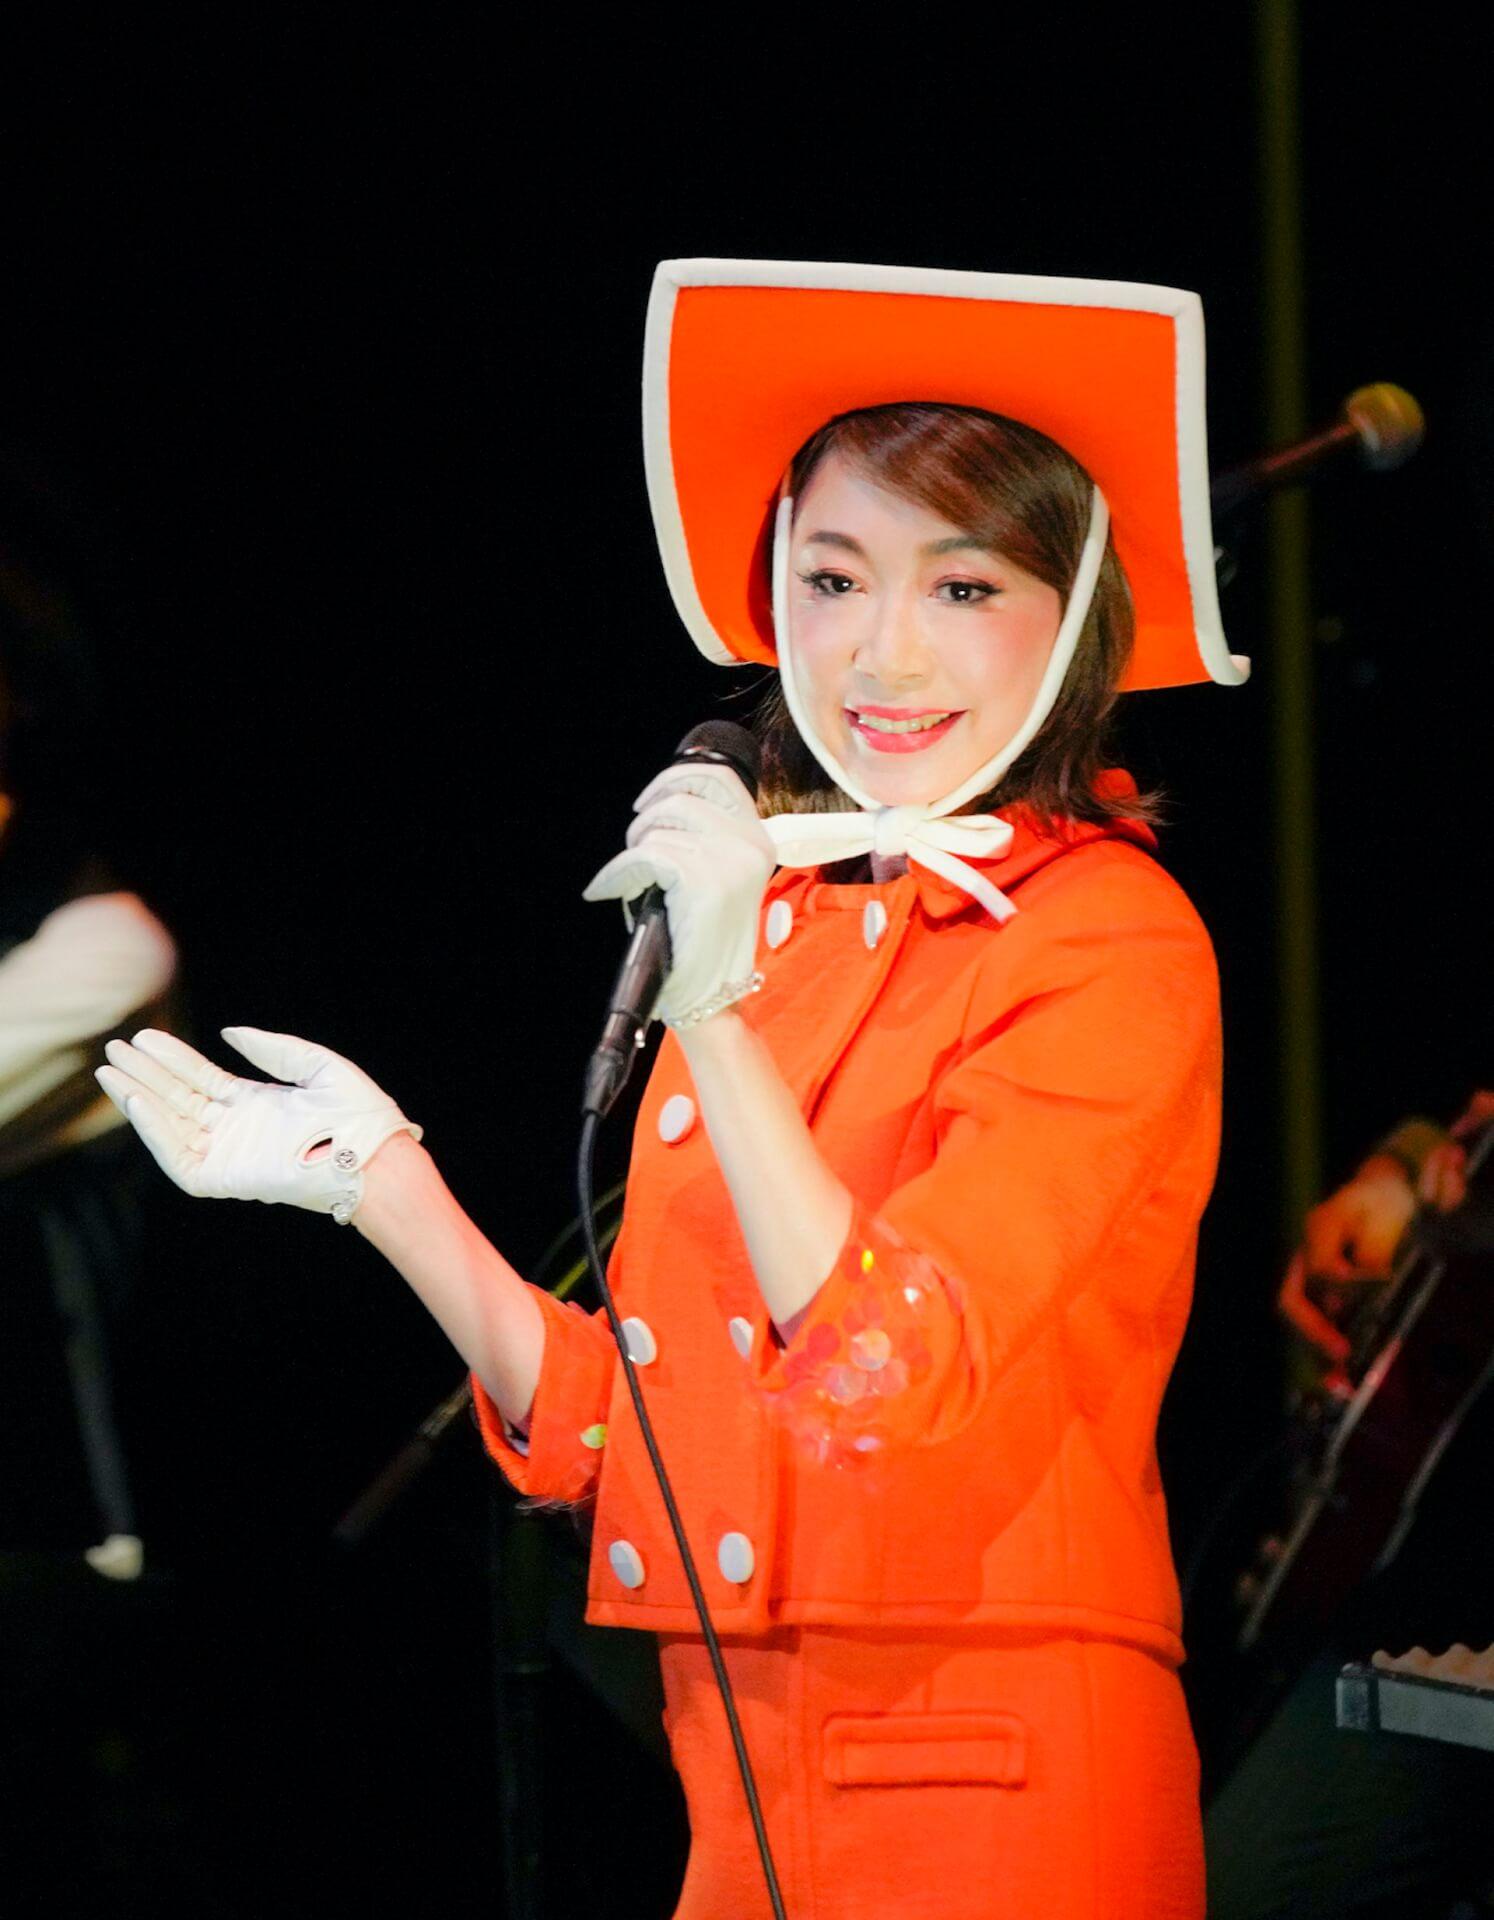 "Naive Superが野宮真貴を迎えた""Memories Of Moonage Nightlife""をリリース!「月」をテーマに連続リリースも決定 music200624_naivesuper_03"